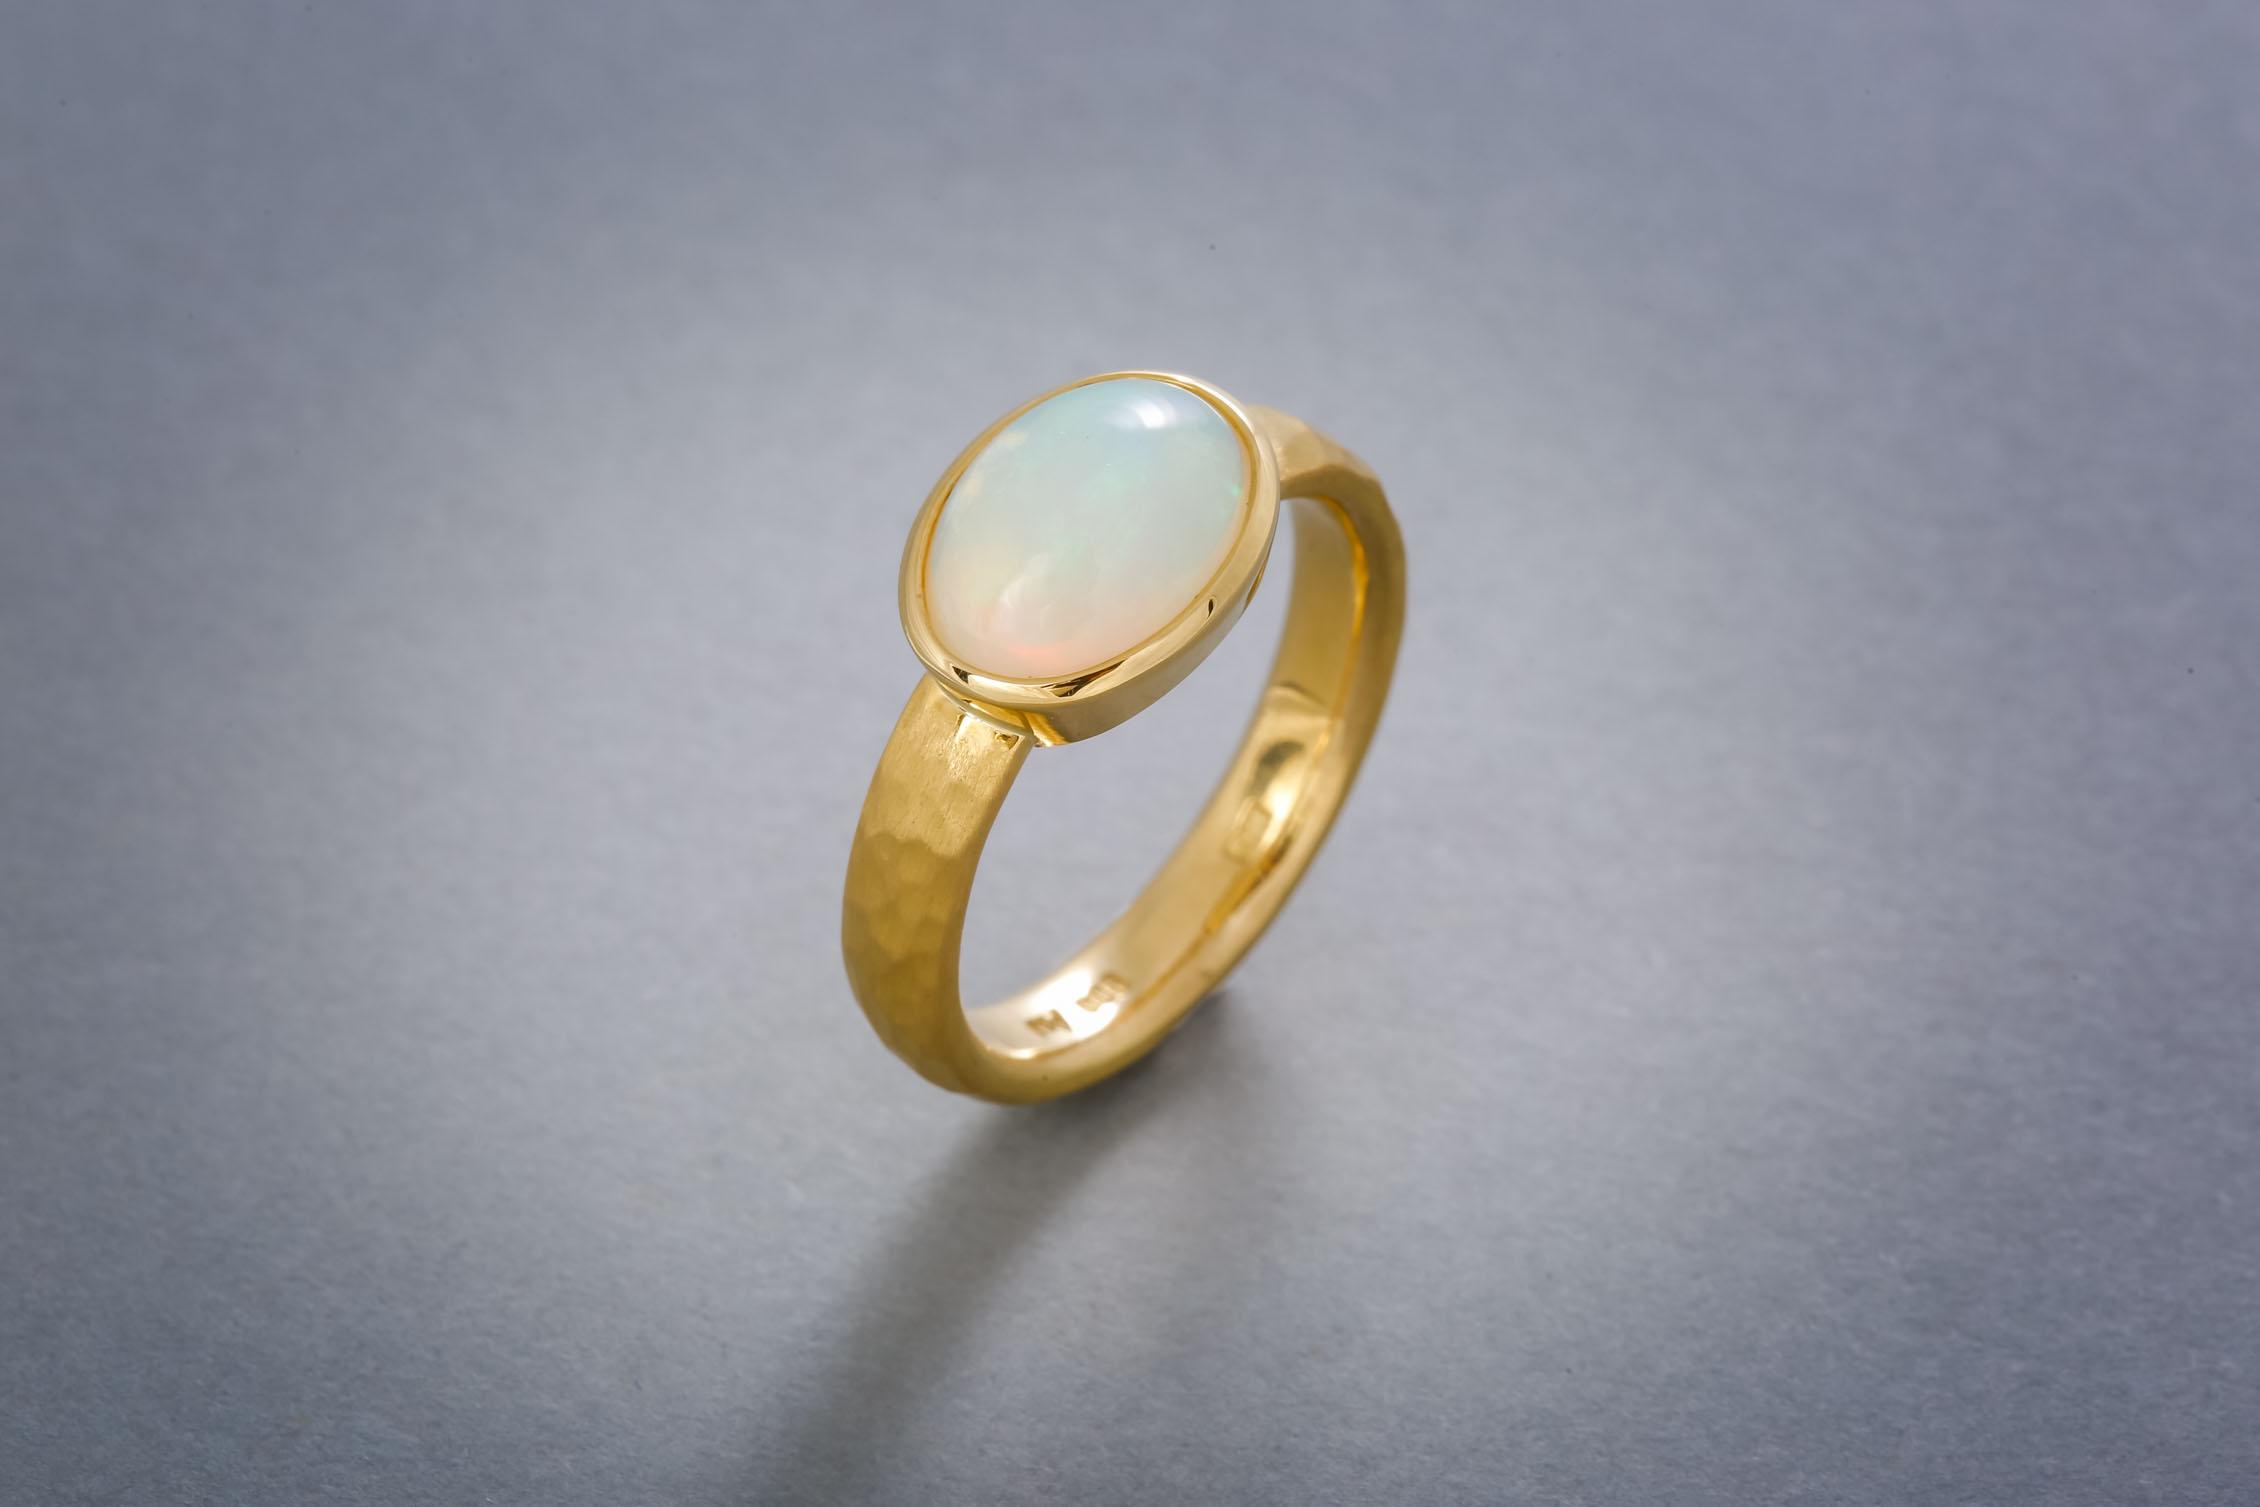 060 21kt Goldring, Opal, Preis auf Anfrage